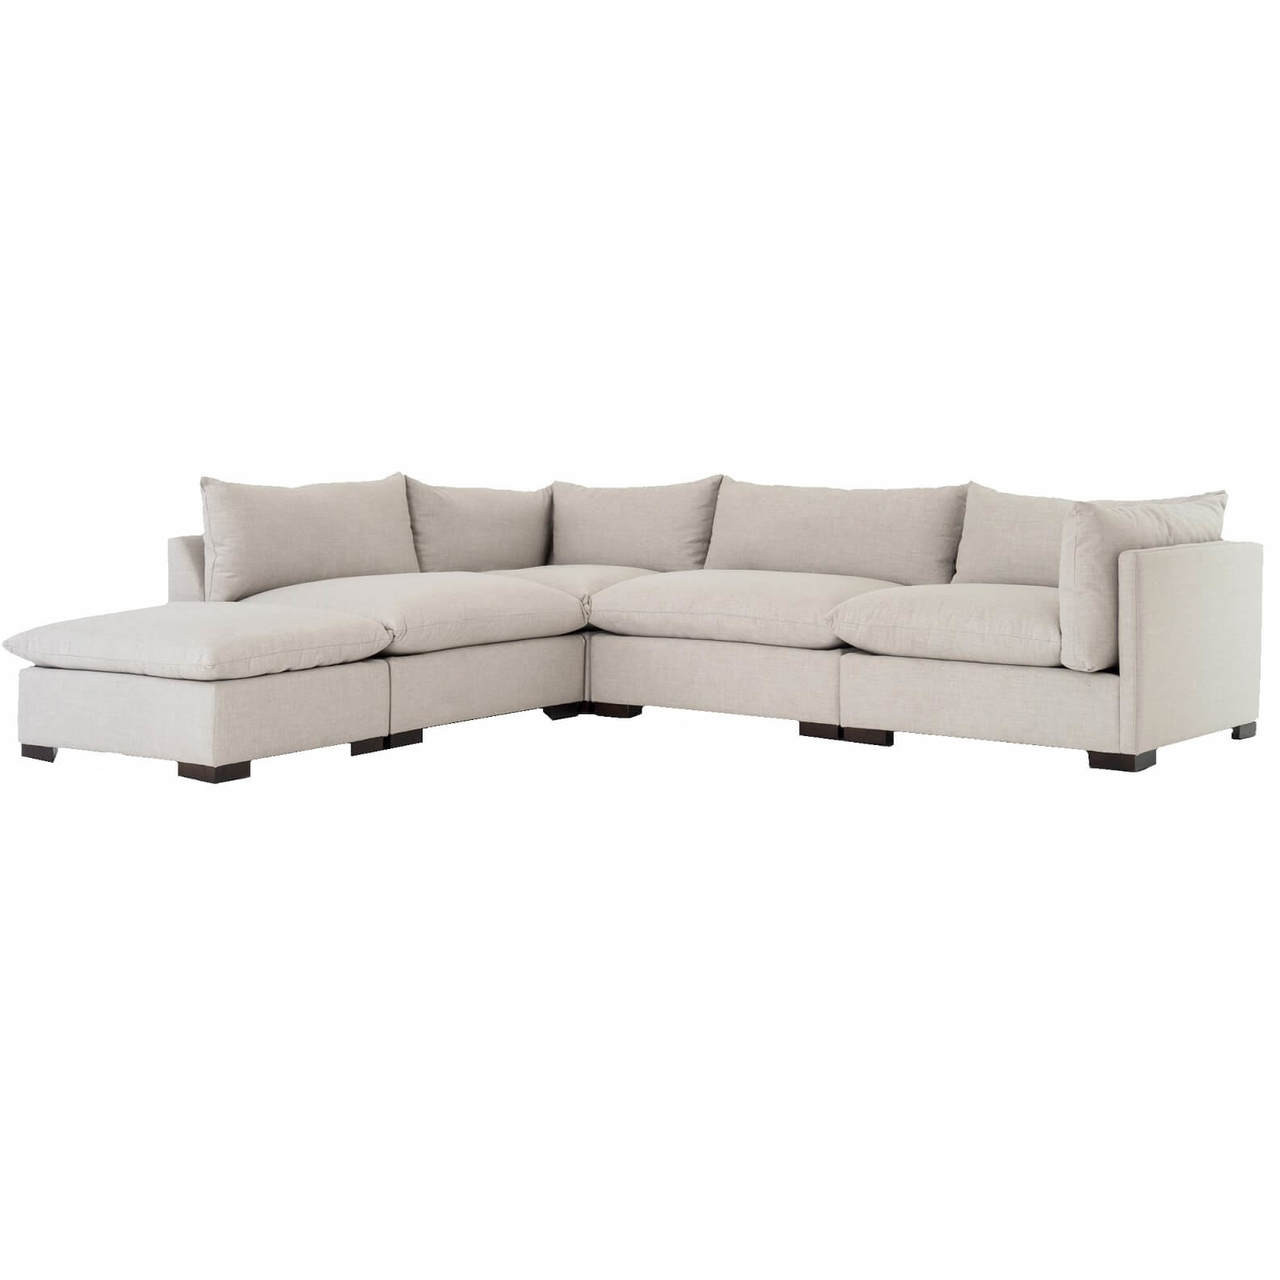 Sensational Westworld Modern Beige 5 Piece Modular Lounge Sectional Sofa Uwap Interior Chair Design Uwaporg